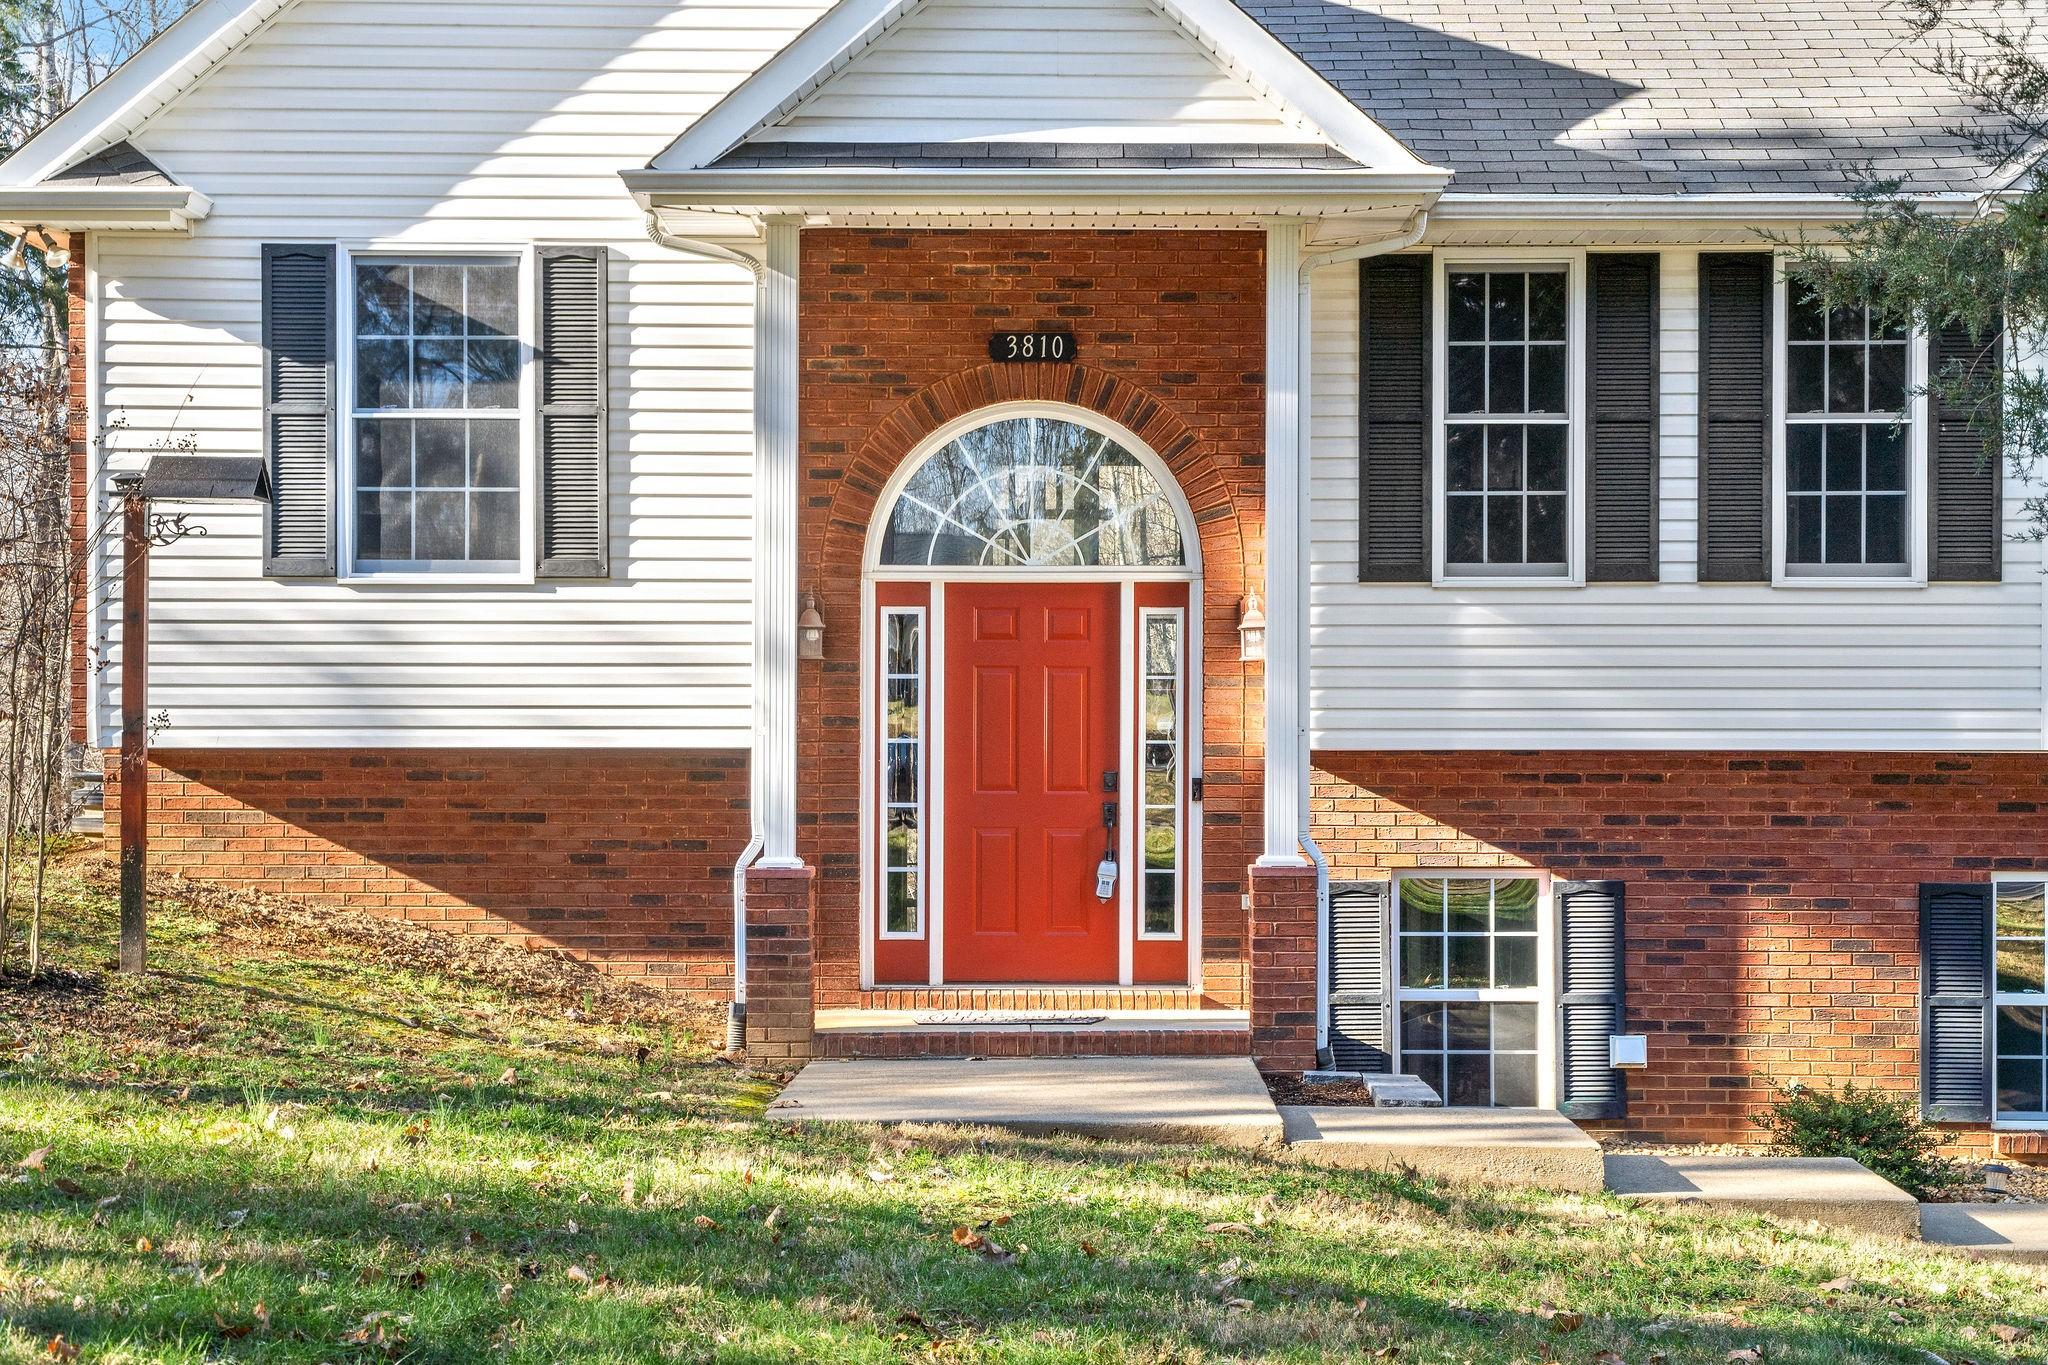 3810 Lake Rd Property Photo - Woodlawn, TN real estate listing